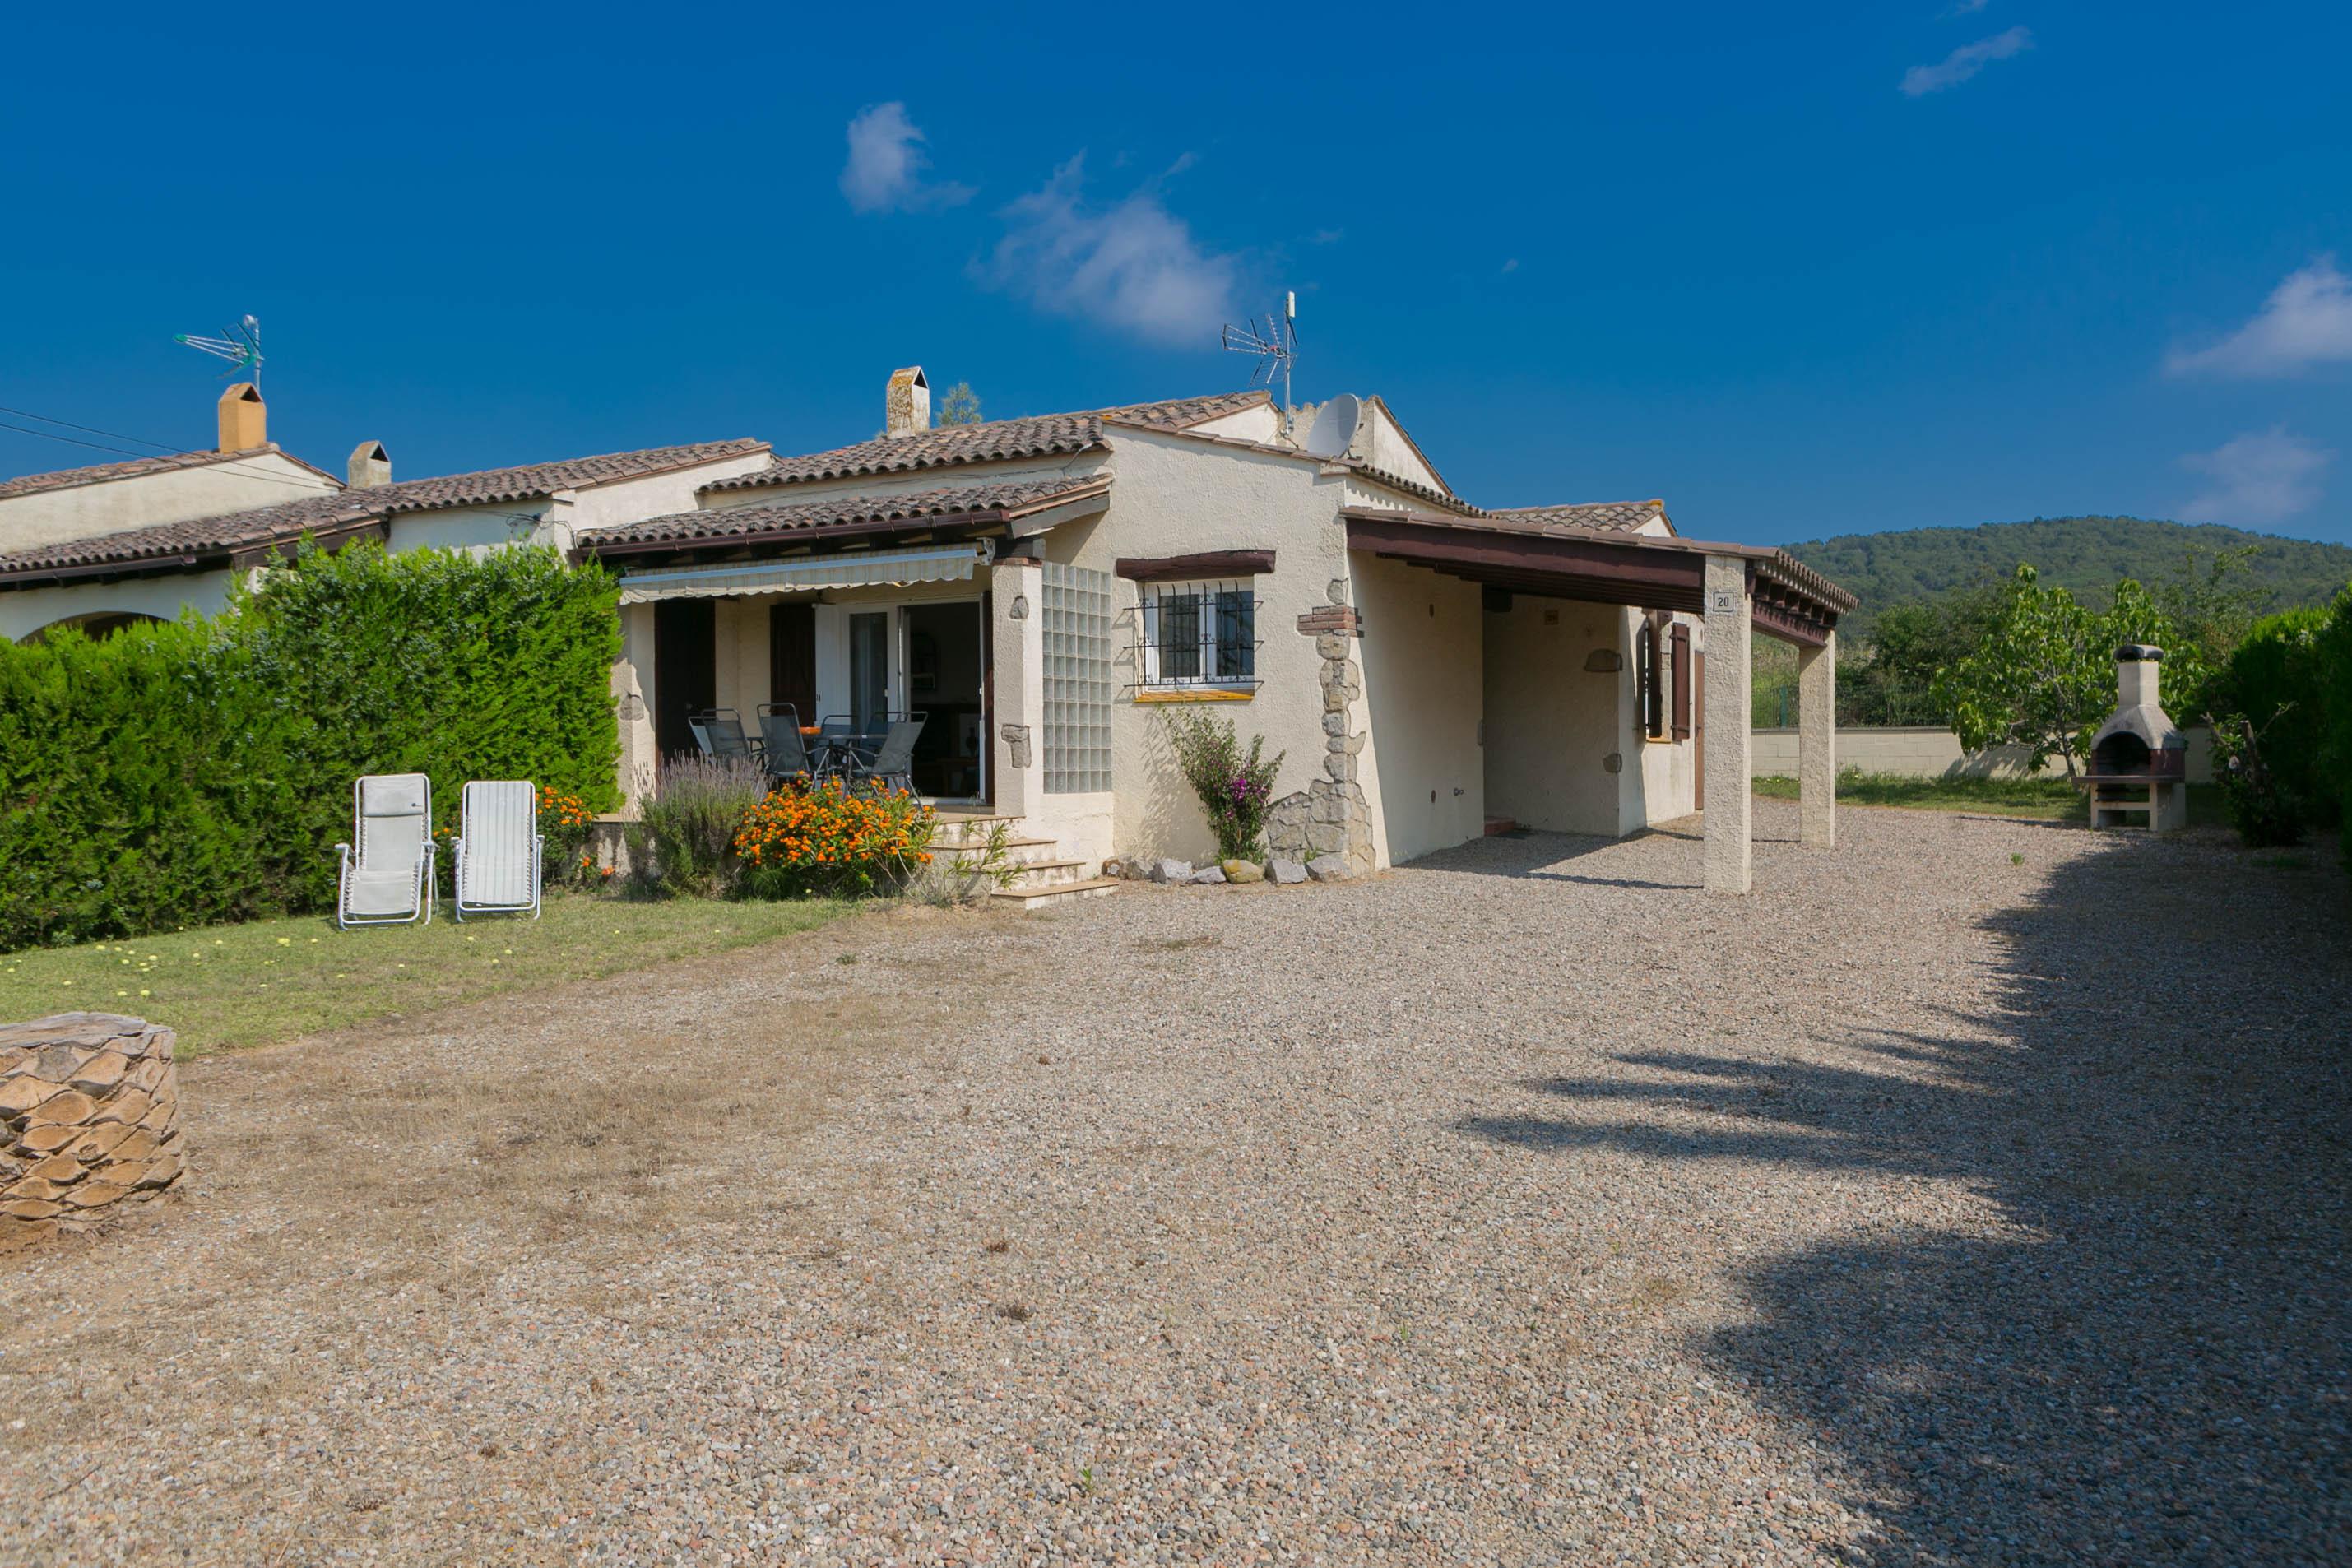 2 bedroom semi-detached house in Urb. Torre Gran, L'Estartit. Garden and community pool (Ref:H38) 2